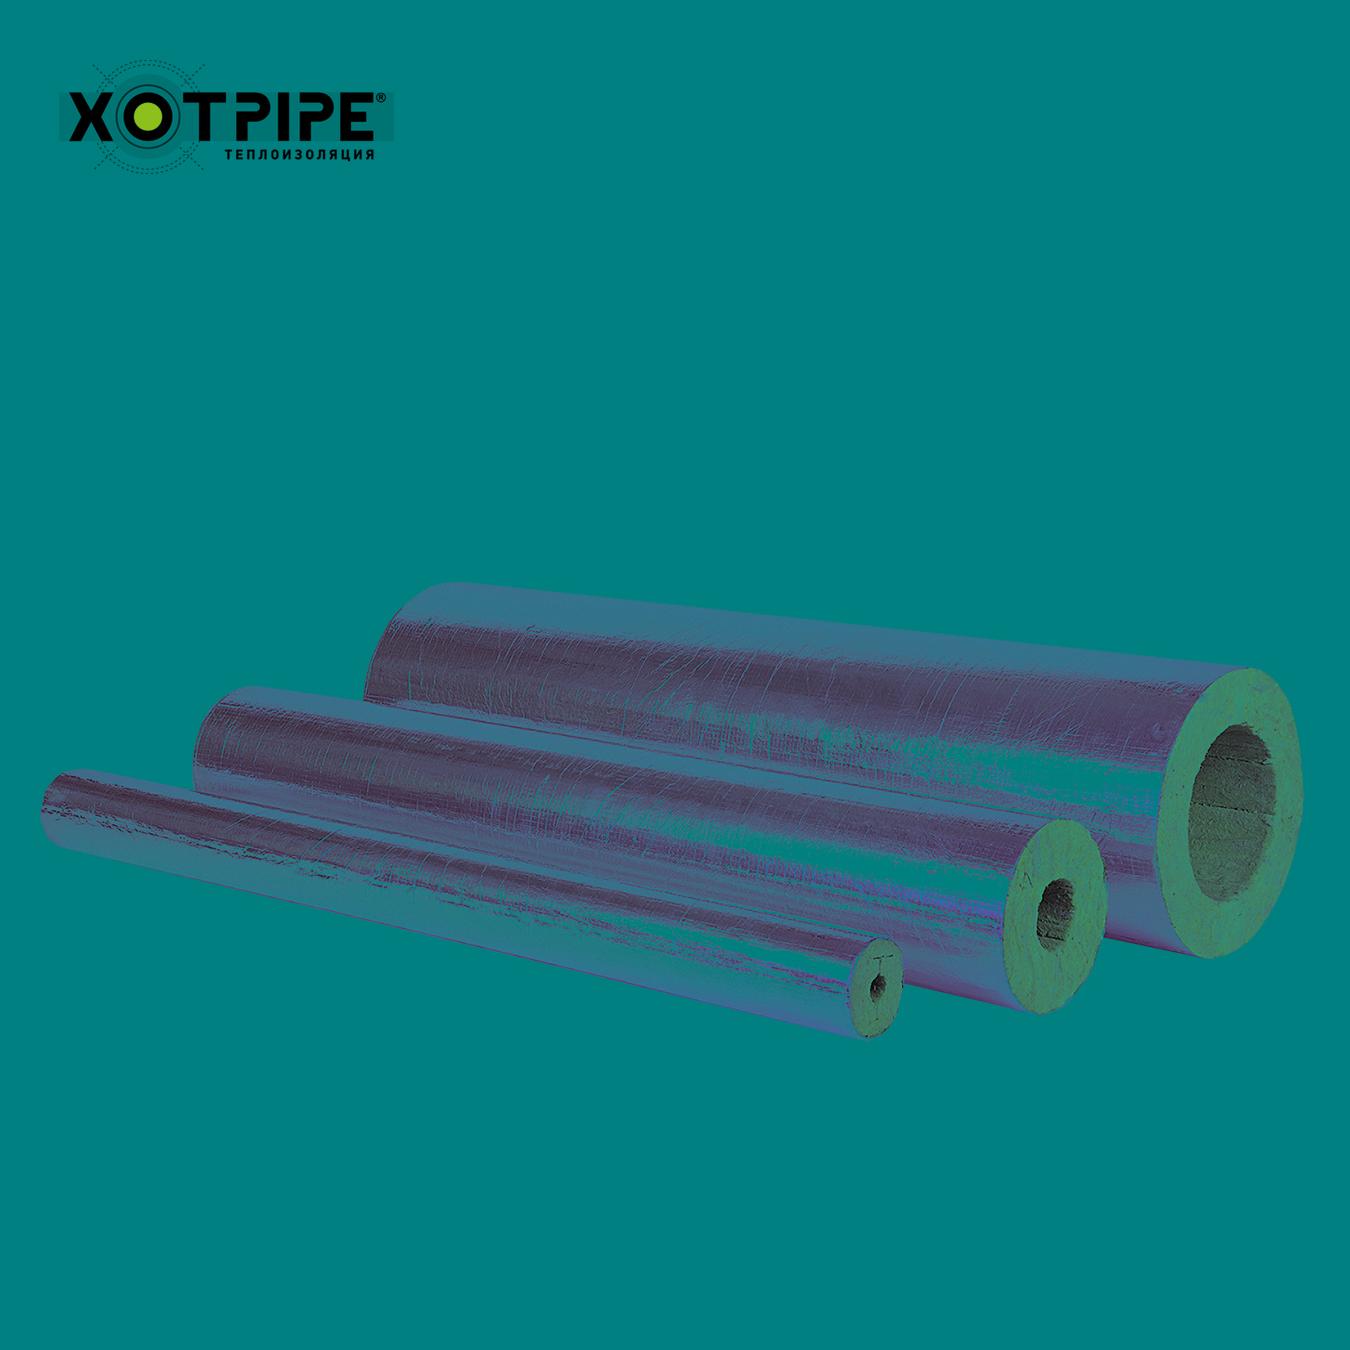 Цилиндр XOTPIPE SP Alu толщ. 110мм, диам. 54мм